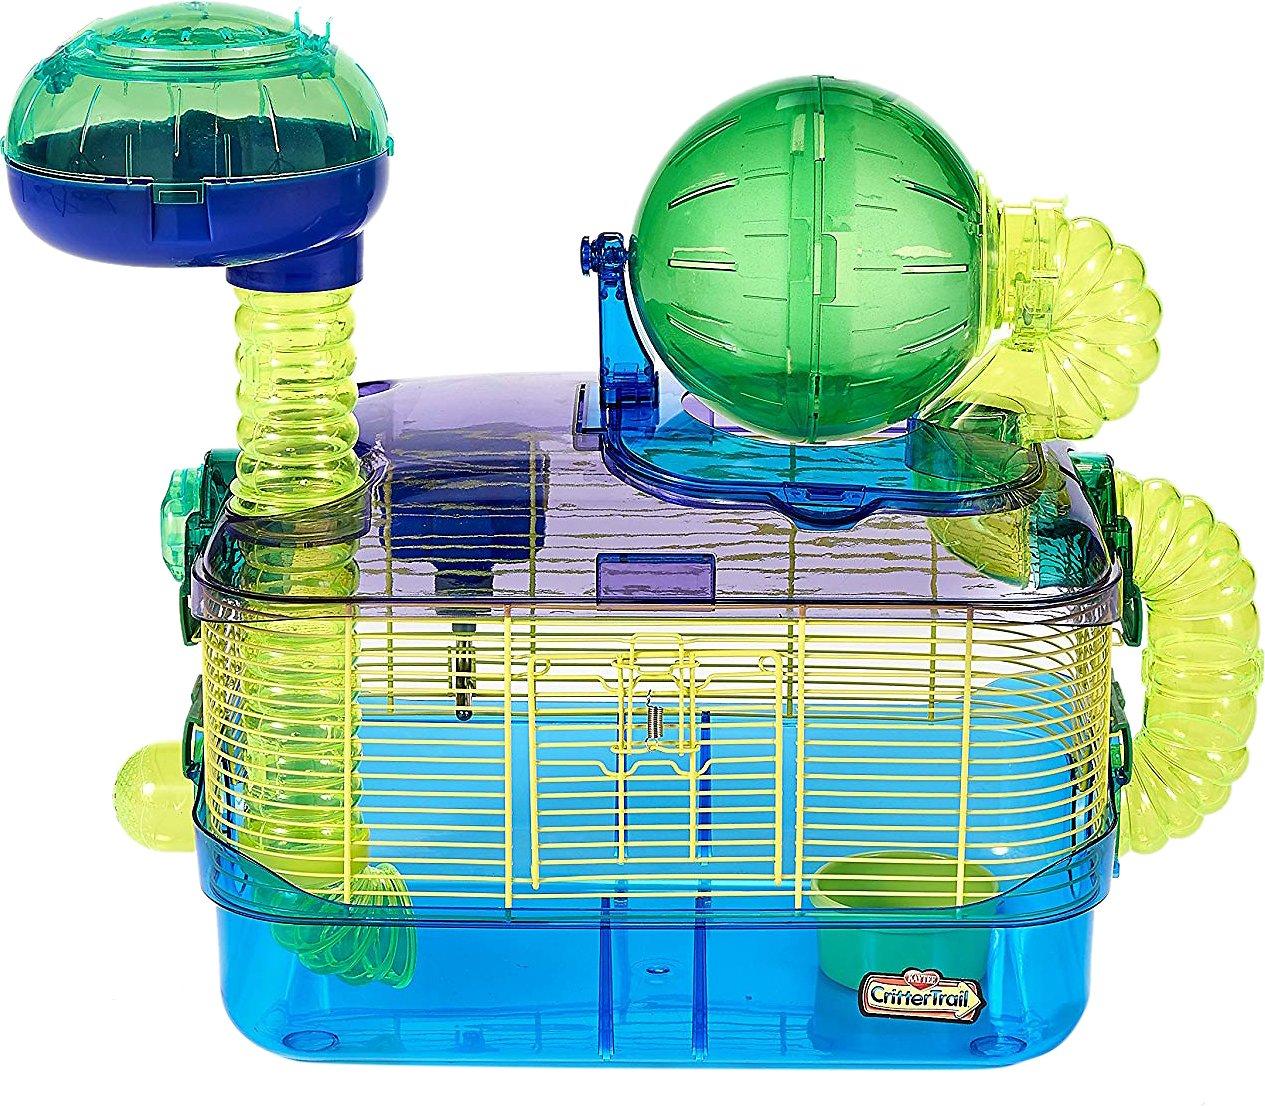 Kaytee CritterTrail Run-About Small Animal Habitat (Size: 40-lb) Image